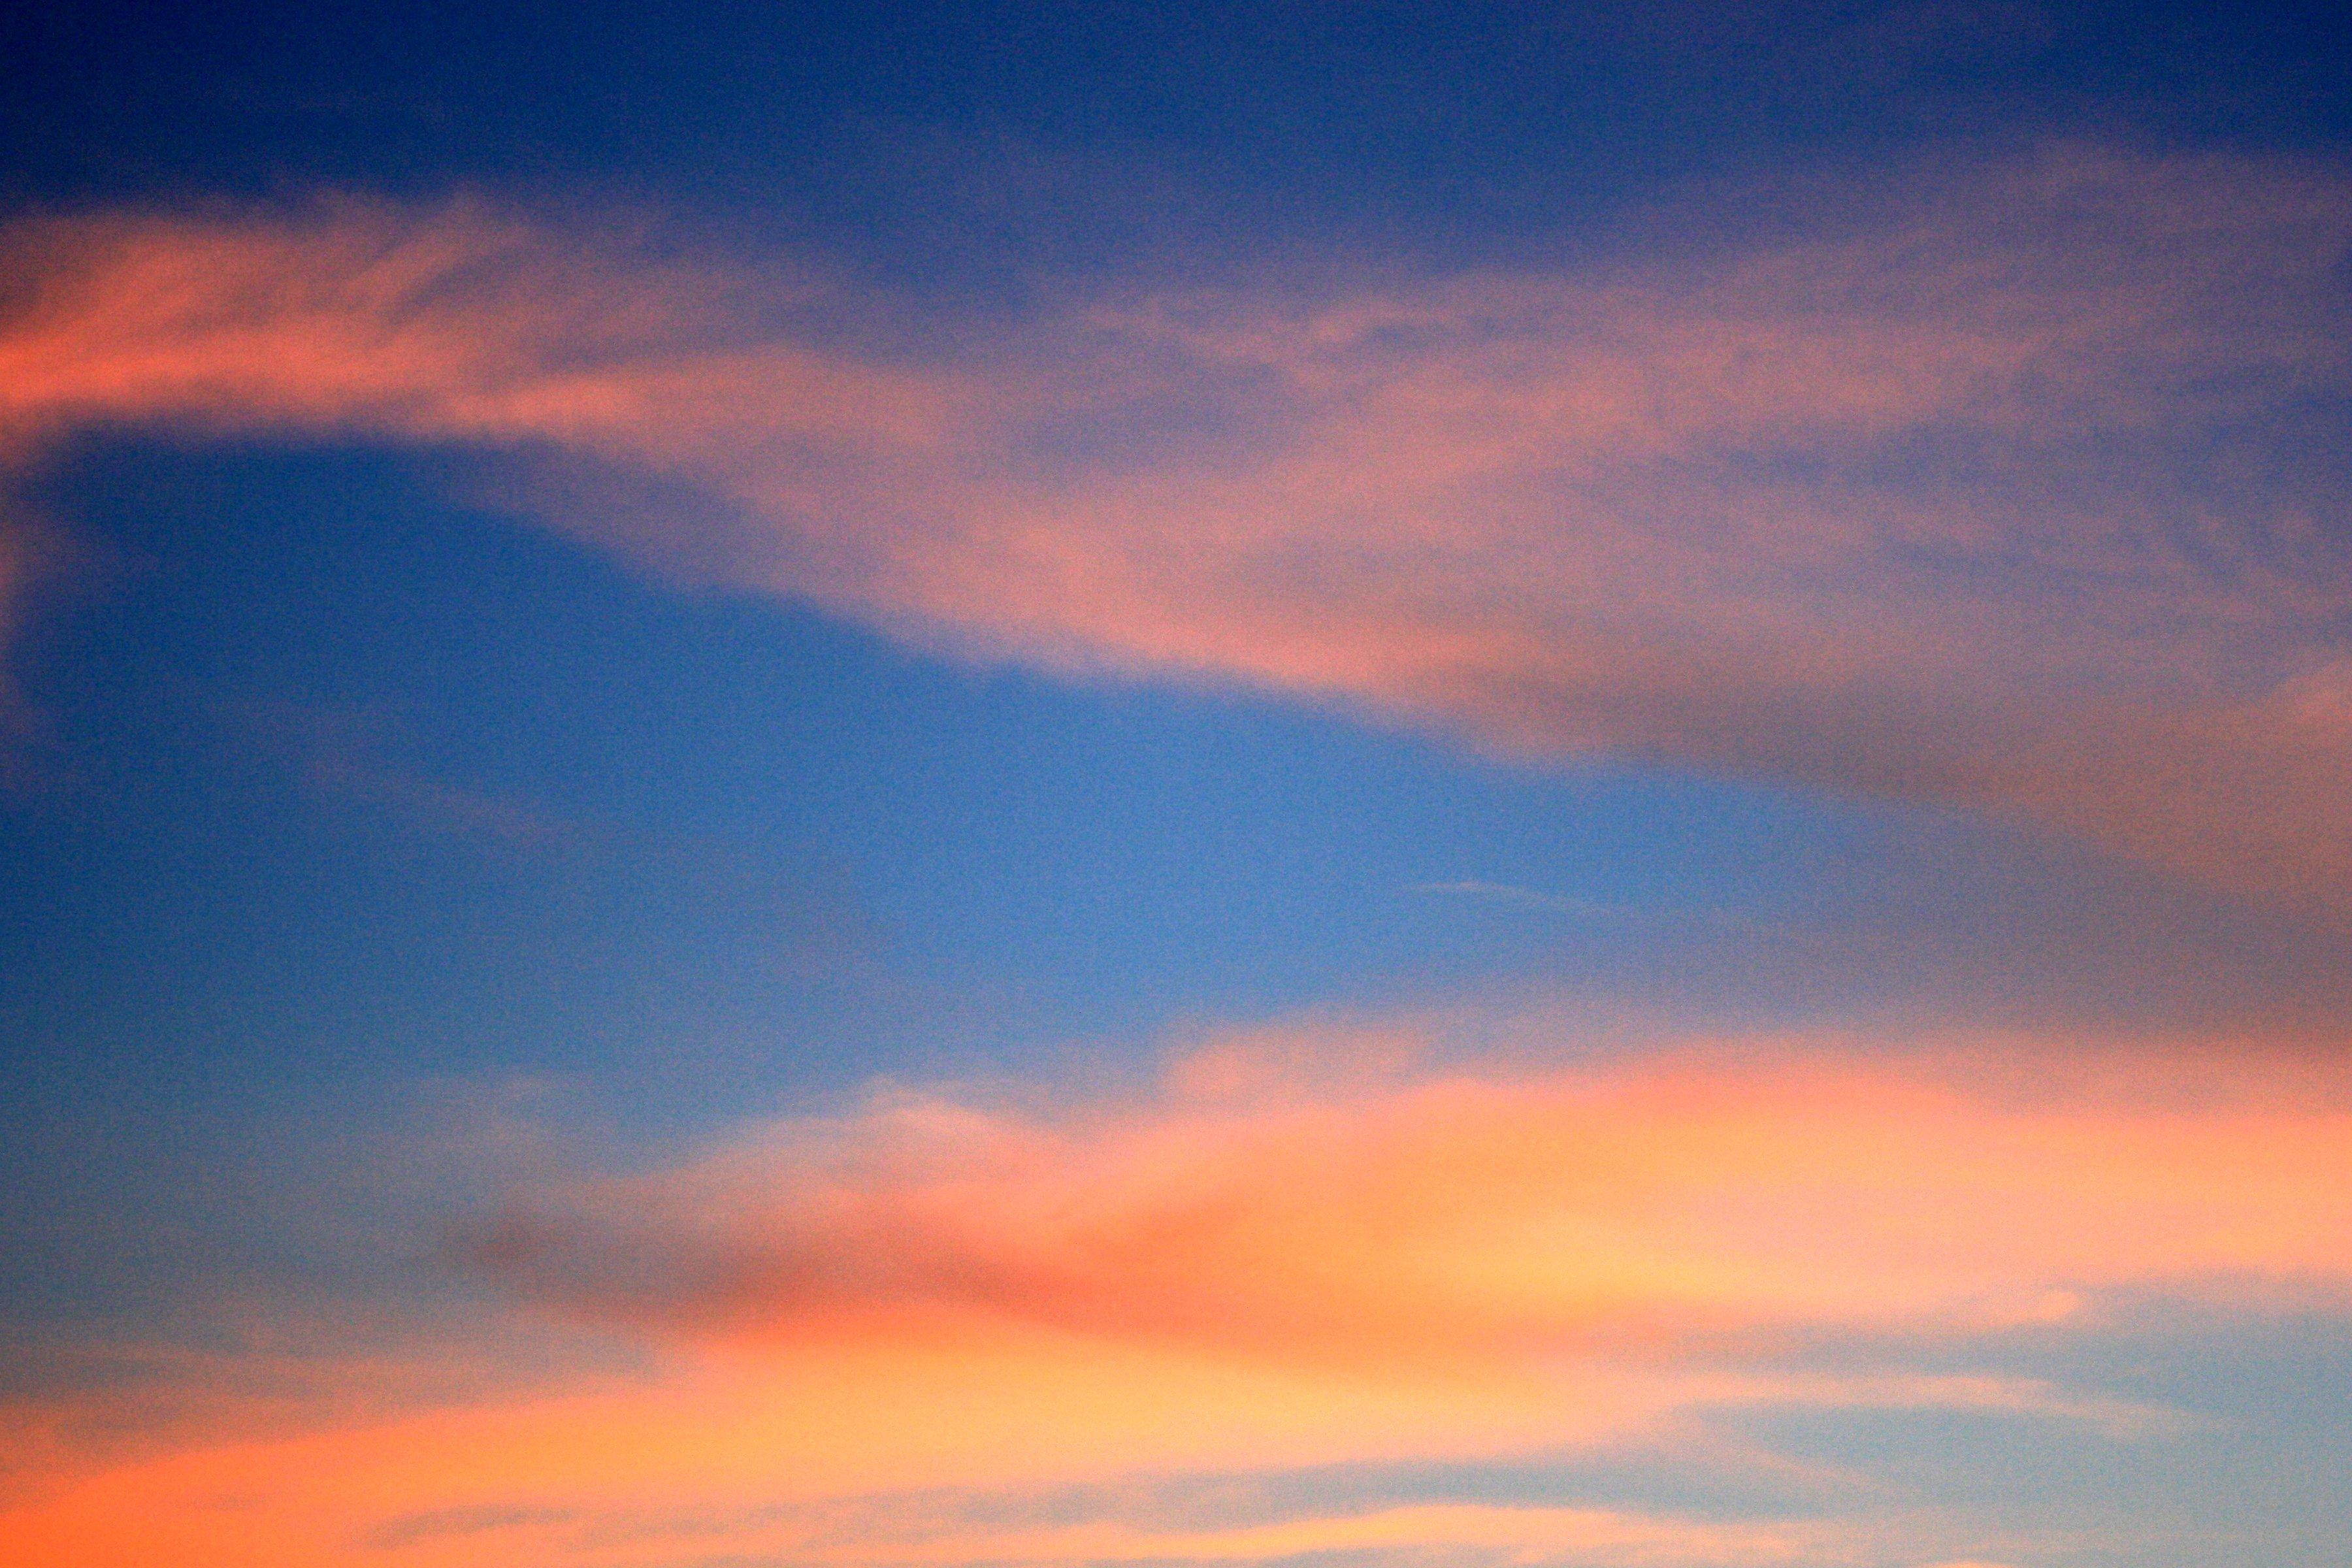 orange jpg deep blue - photo #14